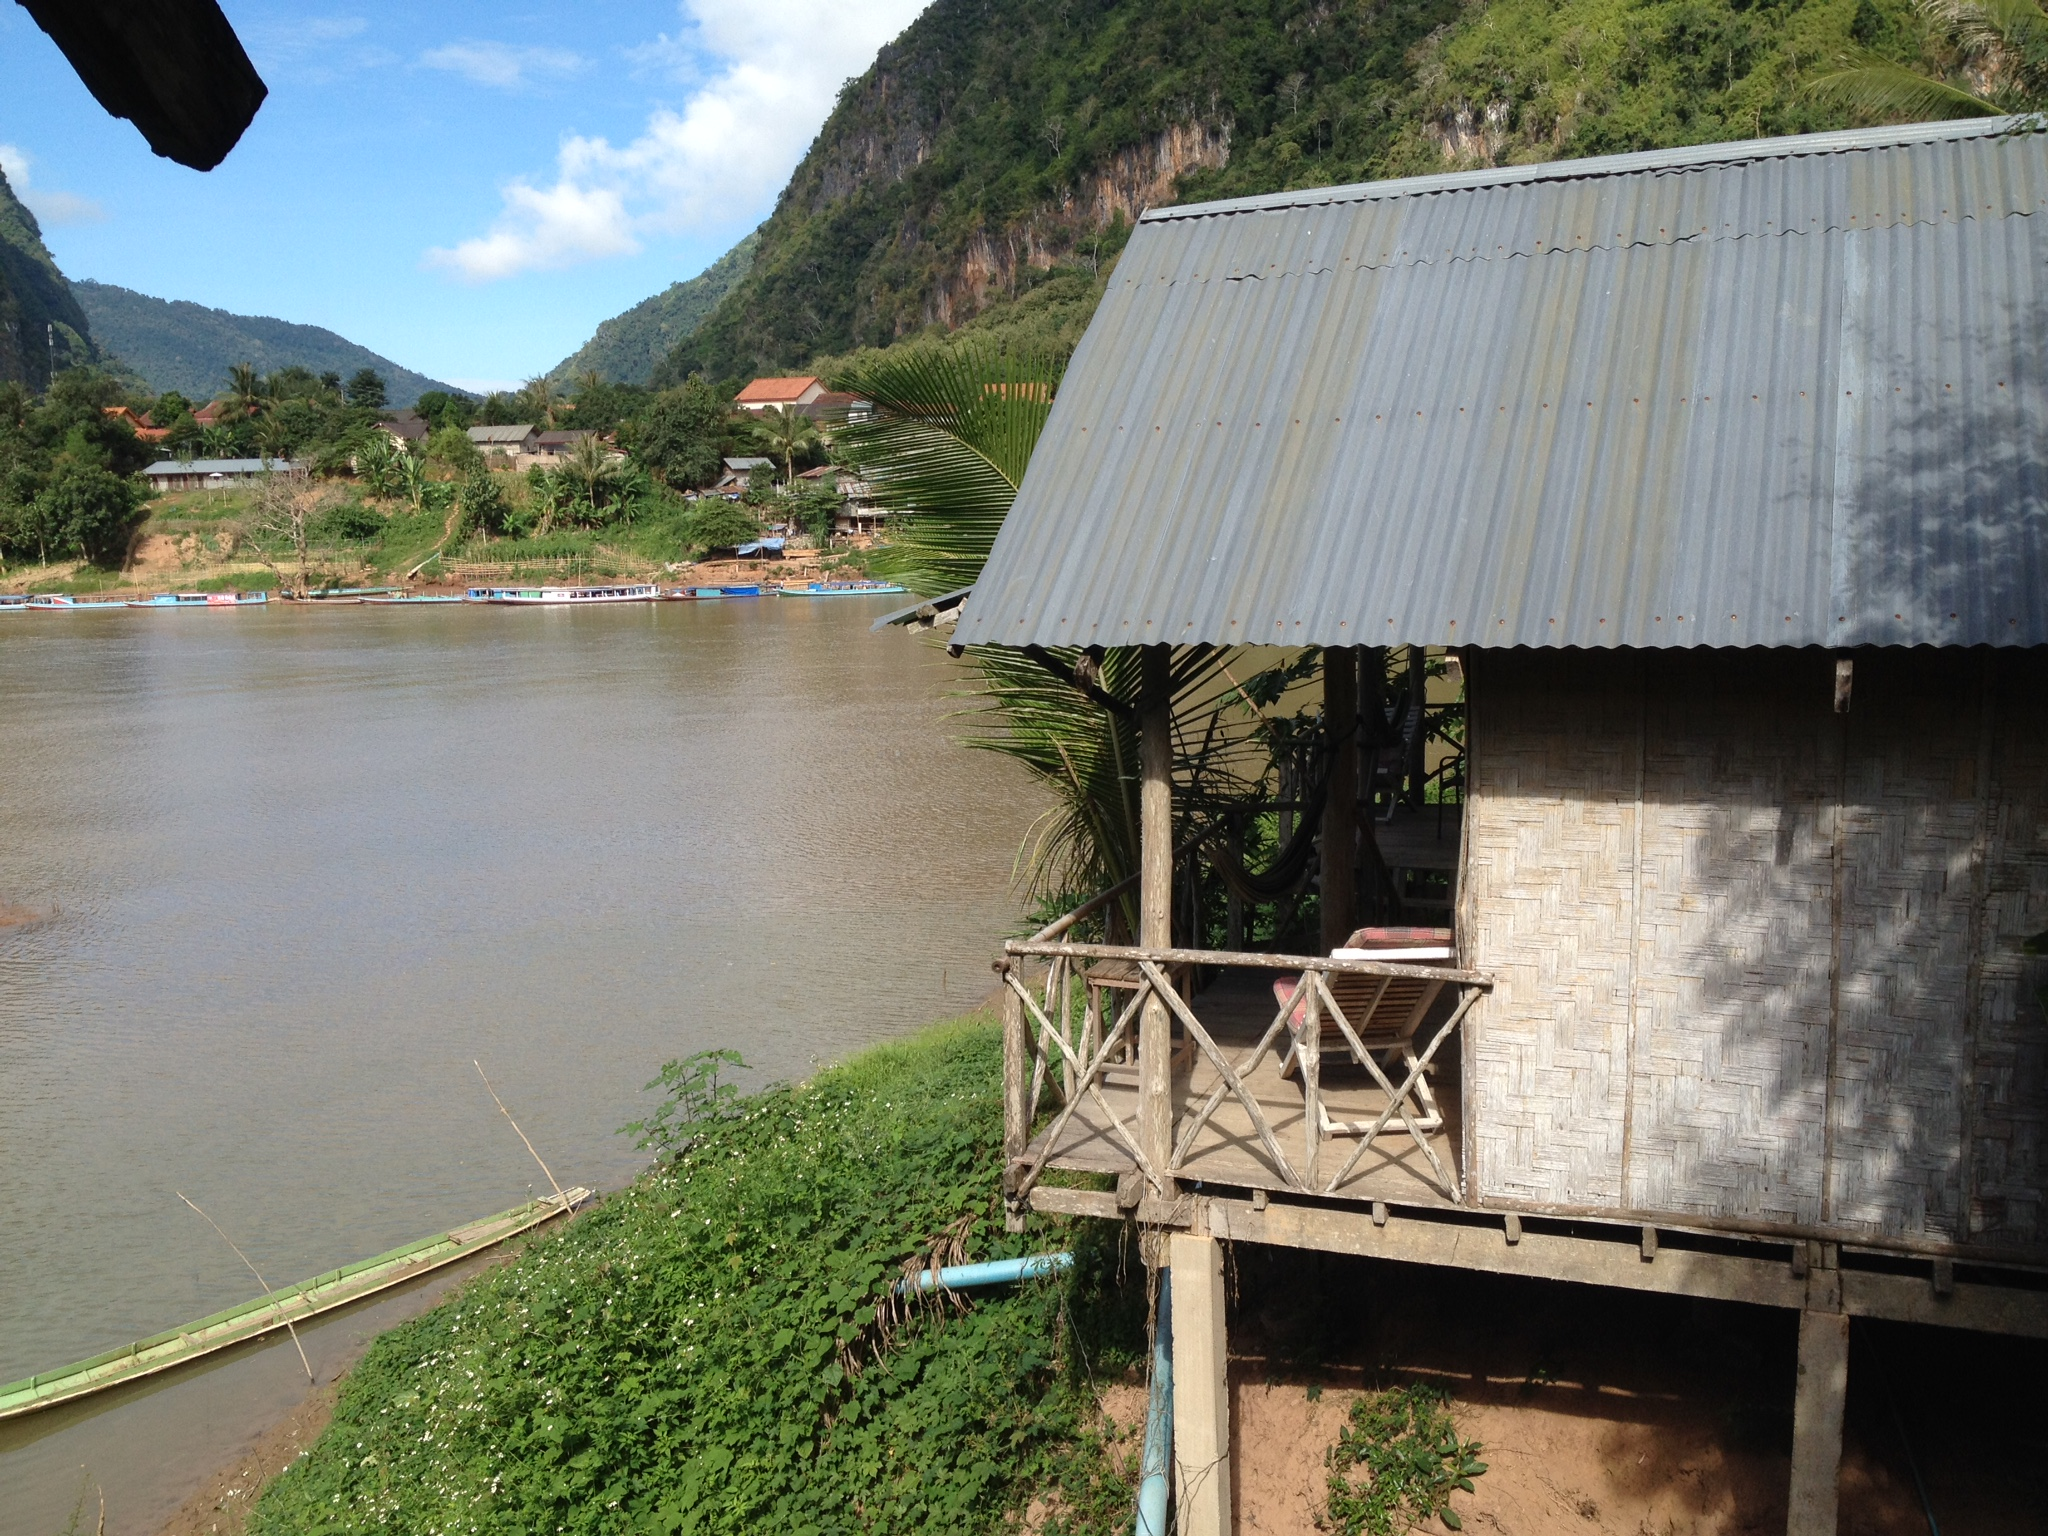 Laos – Nong Kiao – Besuch im Dunkeln in der Bambushütte